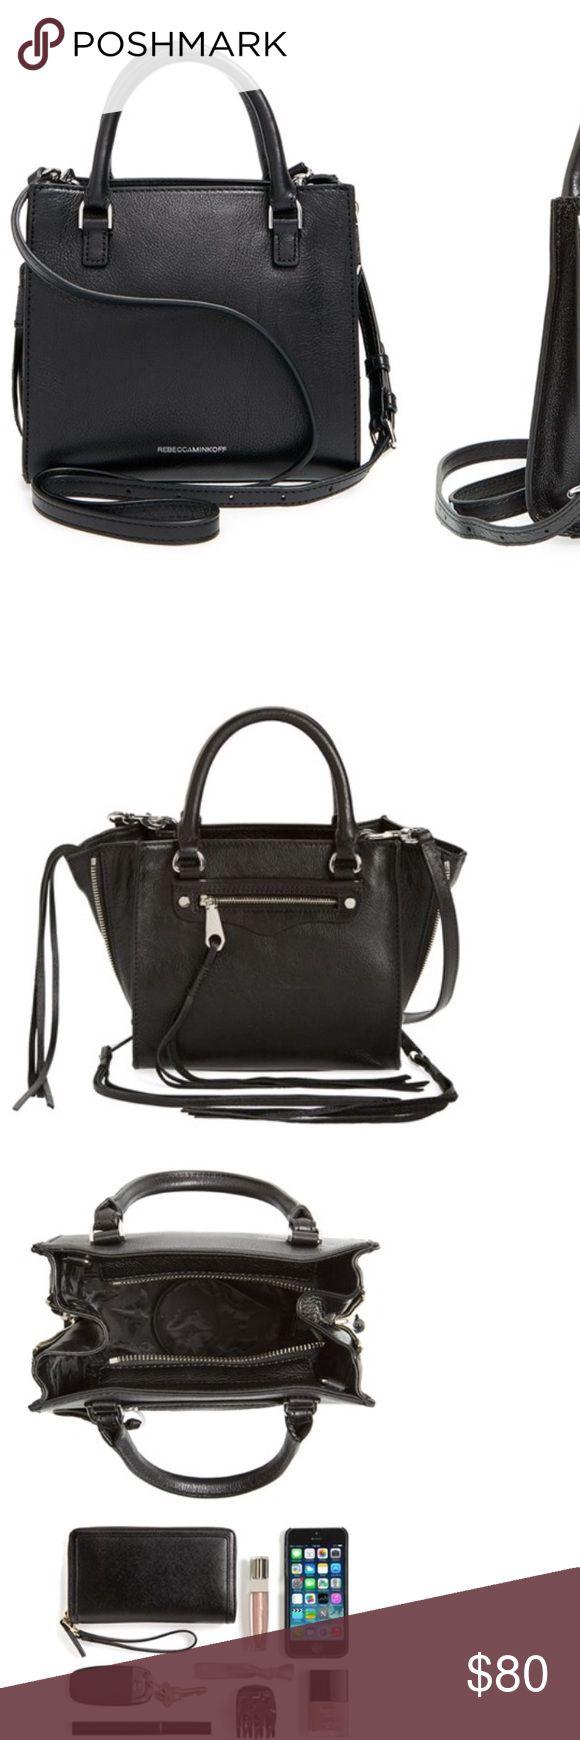 New// Rebecca Minkoff// Black leather mini purse New// Rebecca Minkoff// Black leather mini purse Rebecca Minkoff Bags Mini Bags